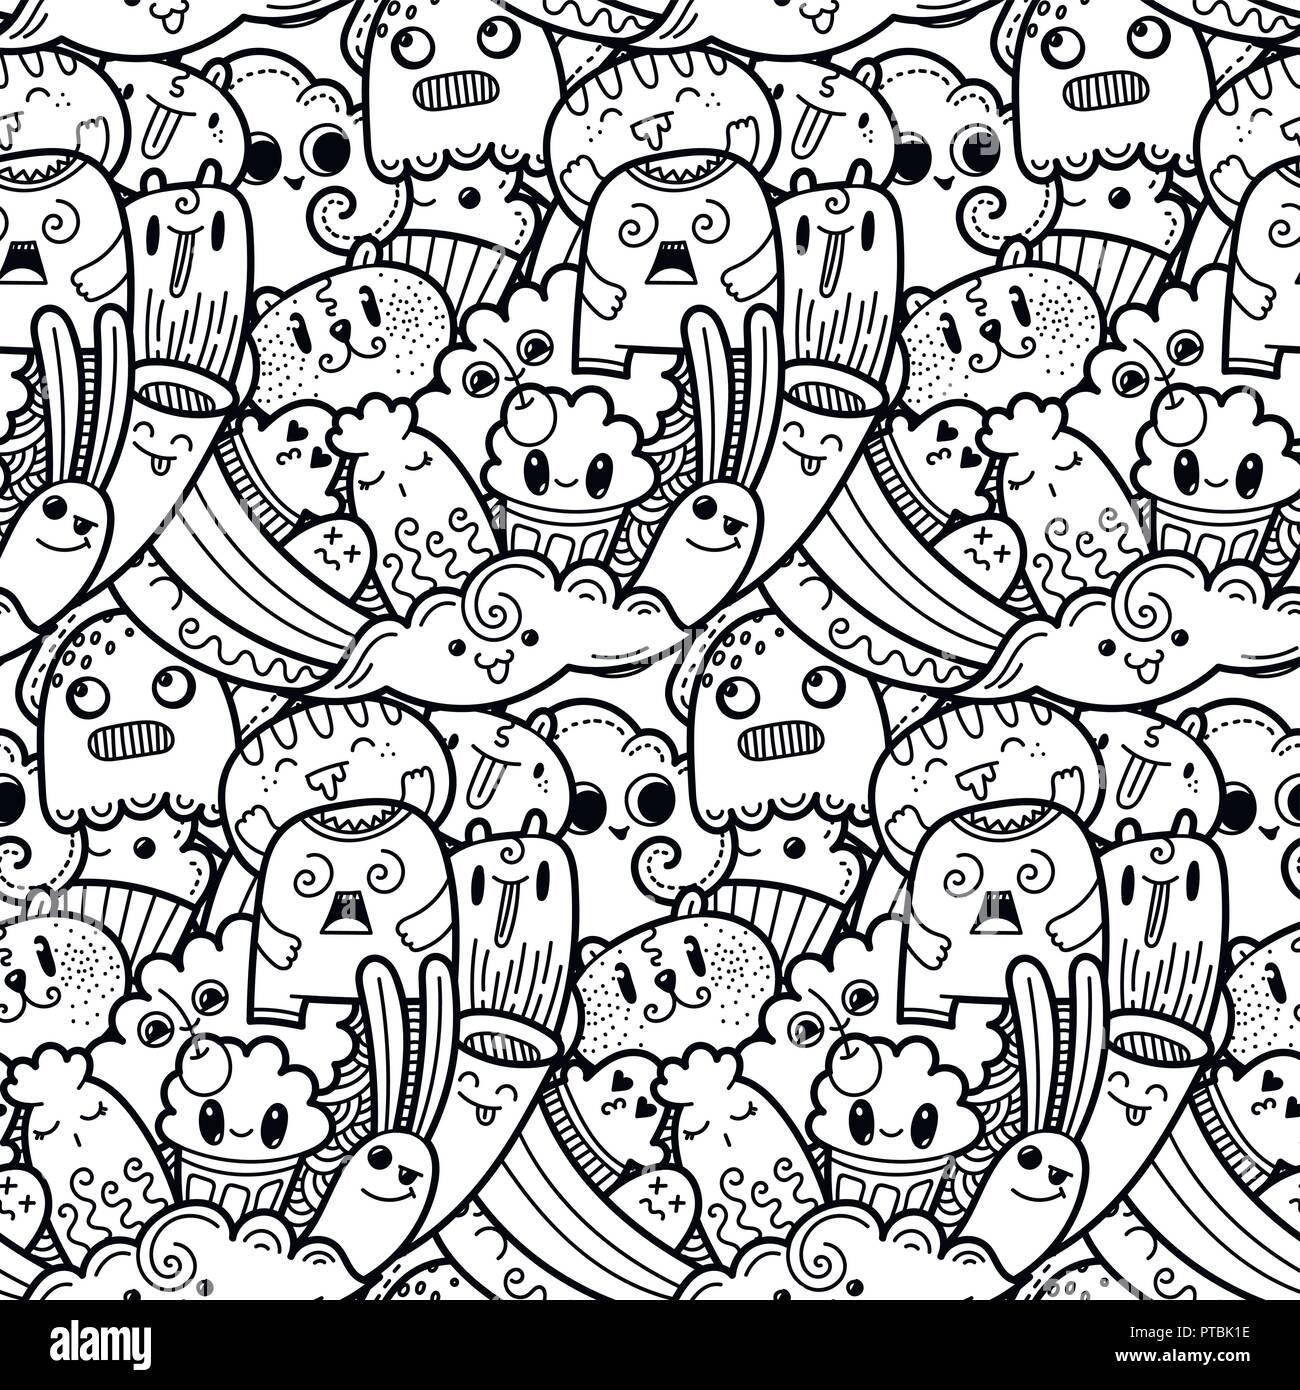 Funny Doodle Mostri Seamless Pattern Per Stampe Disegni E Libri Da